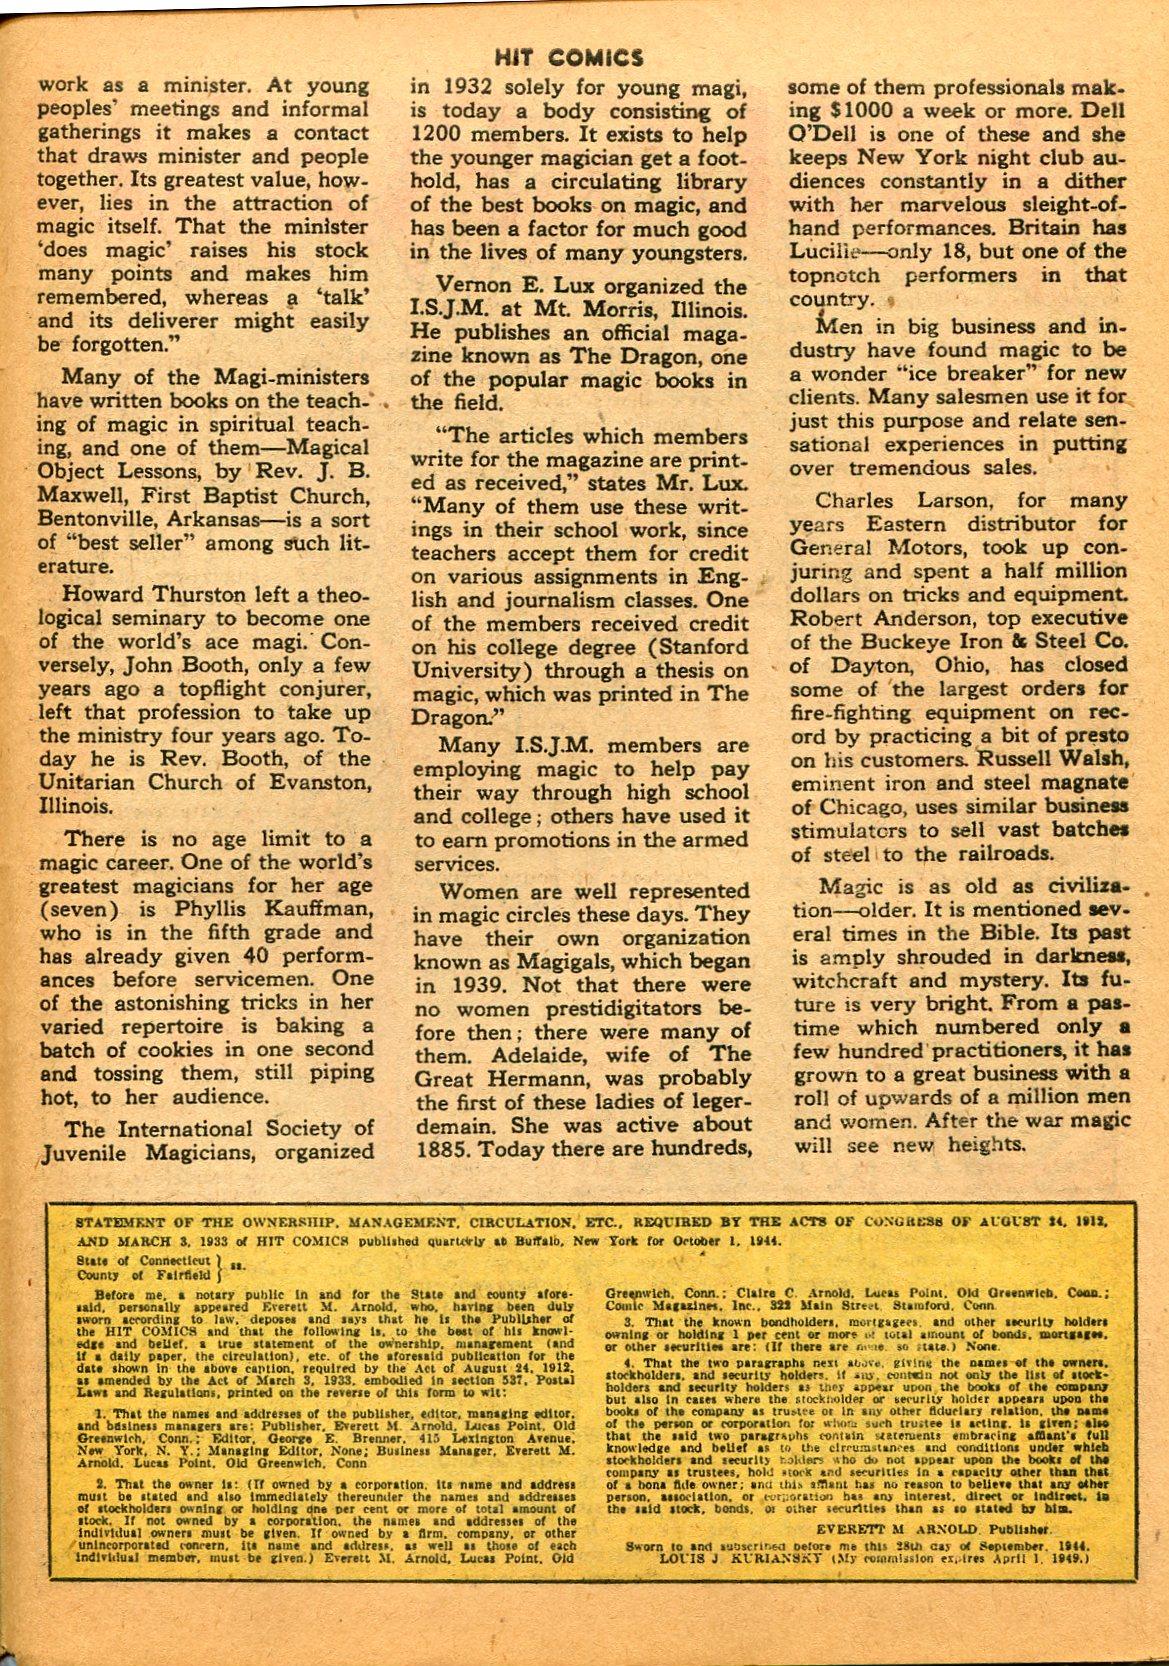 Read online Hit Comics comic -  Issue #35 - 47